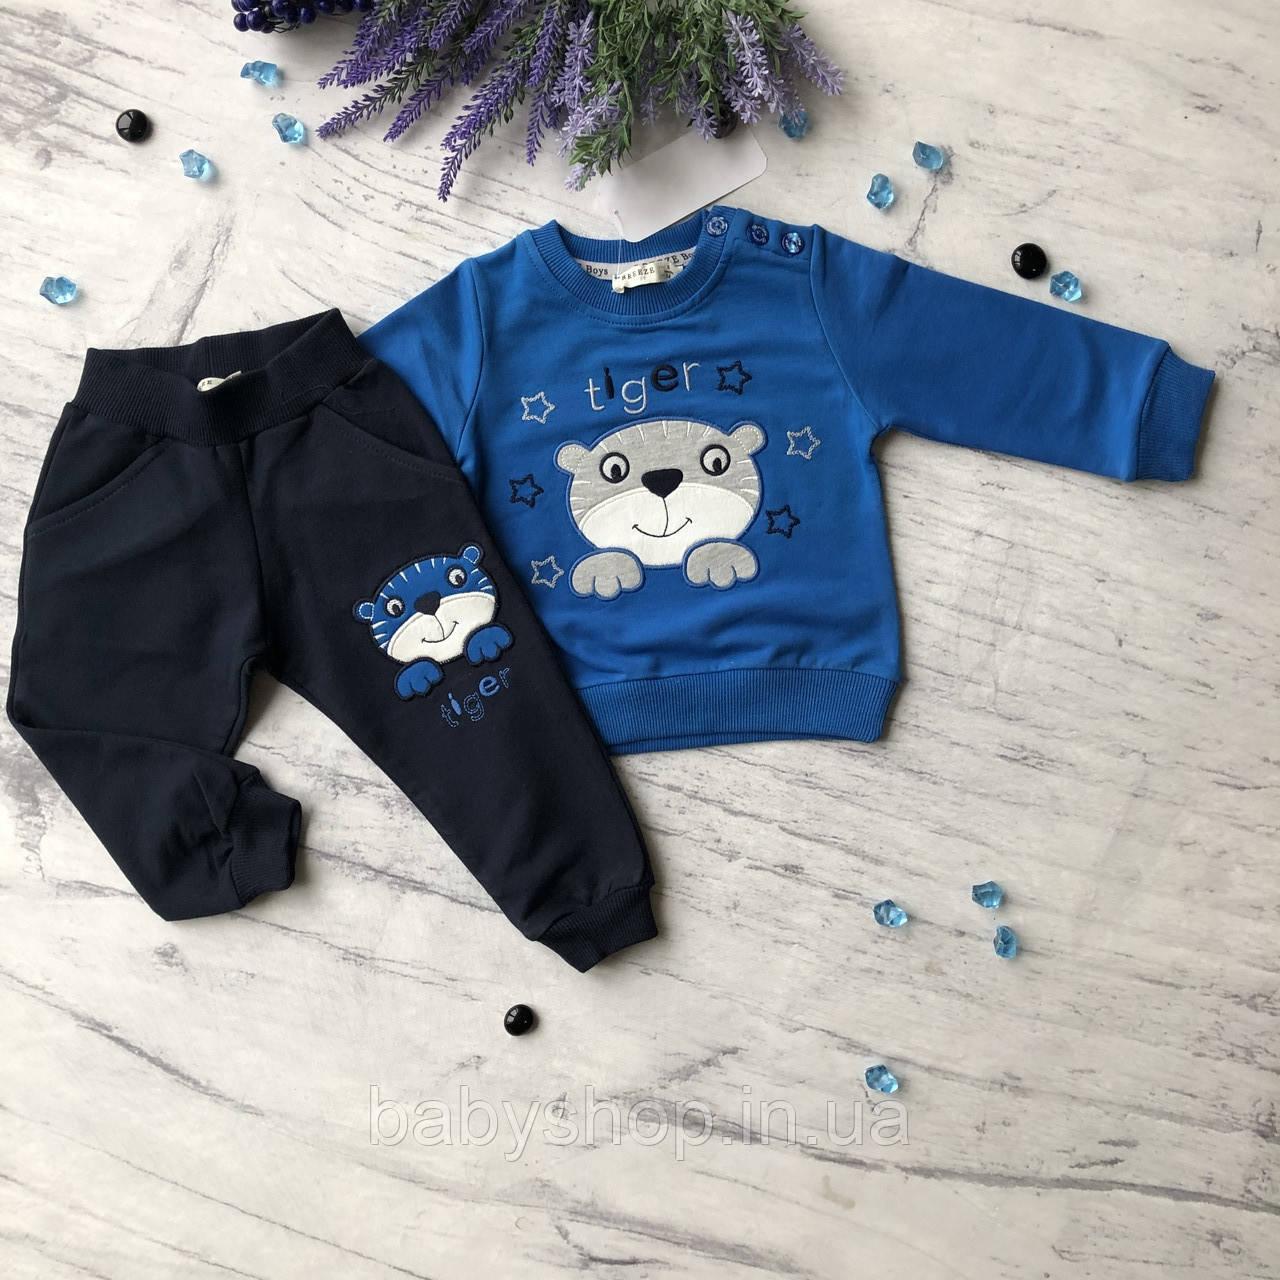 Синий костюм на мальчика Breeze 225. Размер 68 см